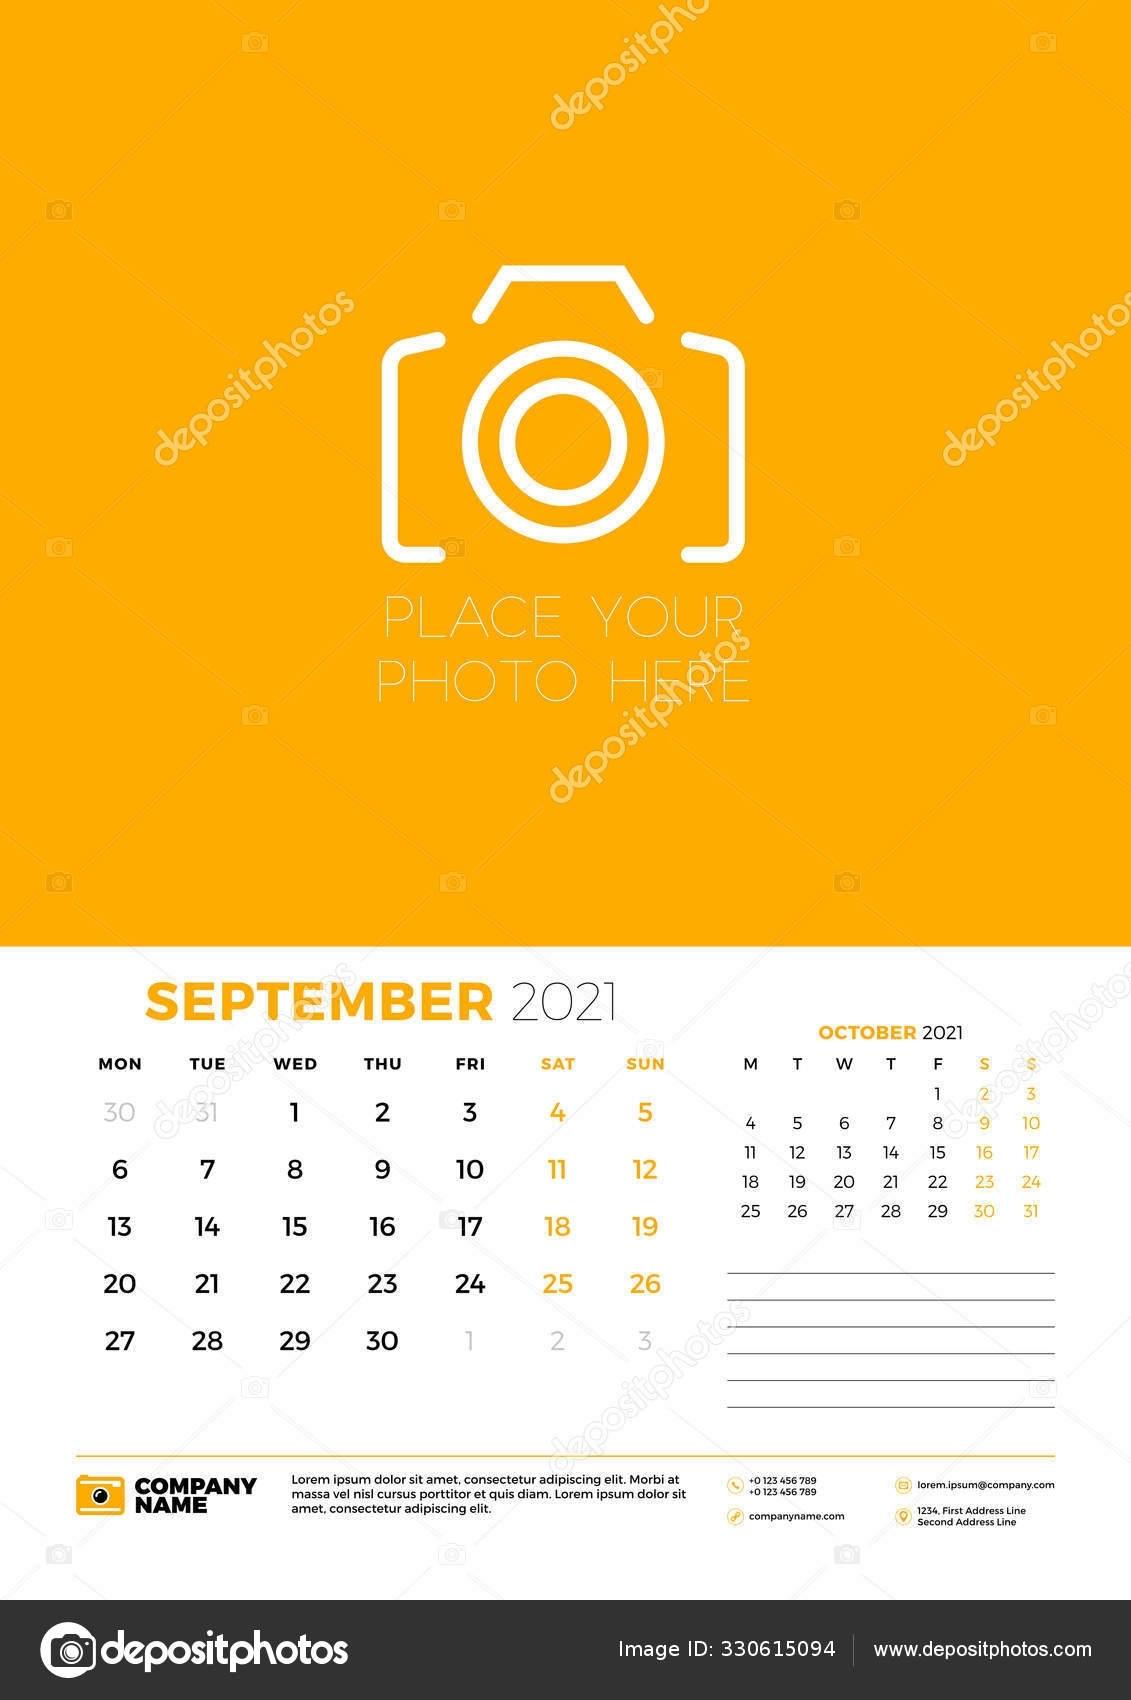 Calendar For September 2021. Week Starts On Monday. Wall Calendar Planner  Template. Vector Illustration 330615094